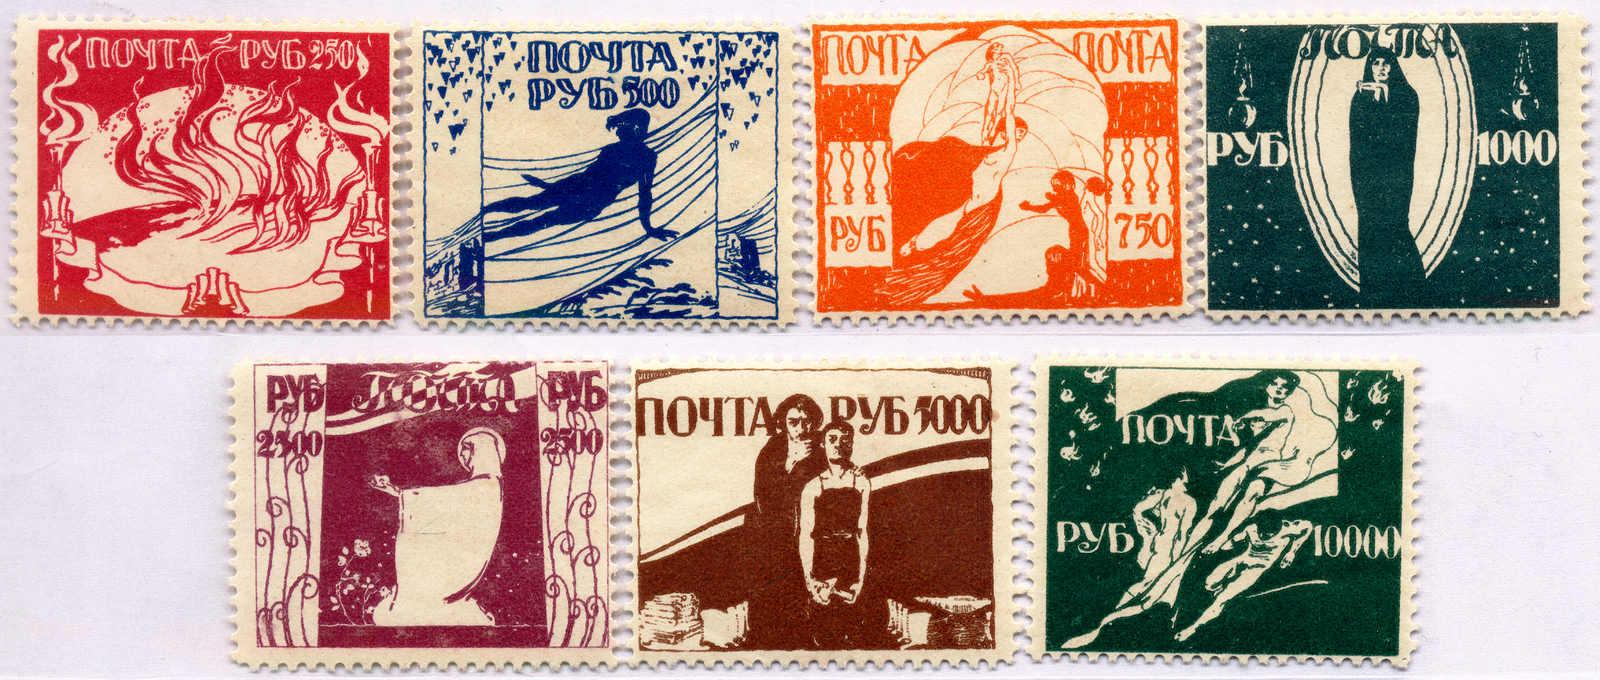 Lot 10198 - europe Russia -  classicphil GmbH 3 rd classicphil Auction - VIENNA- AUSTRIA